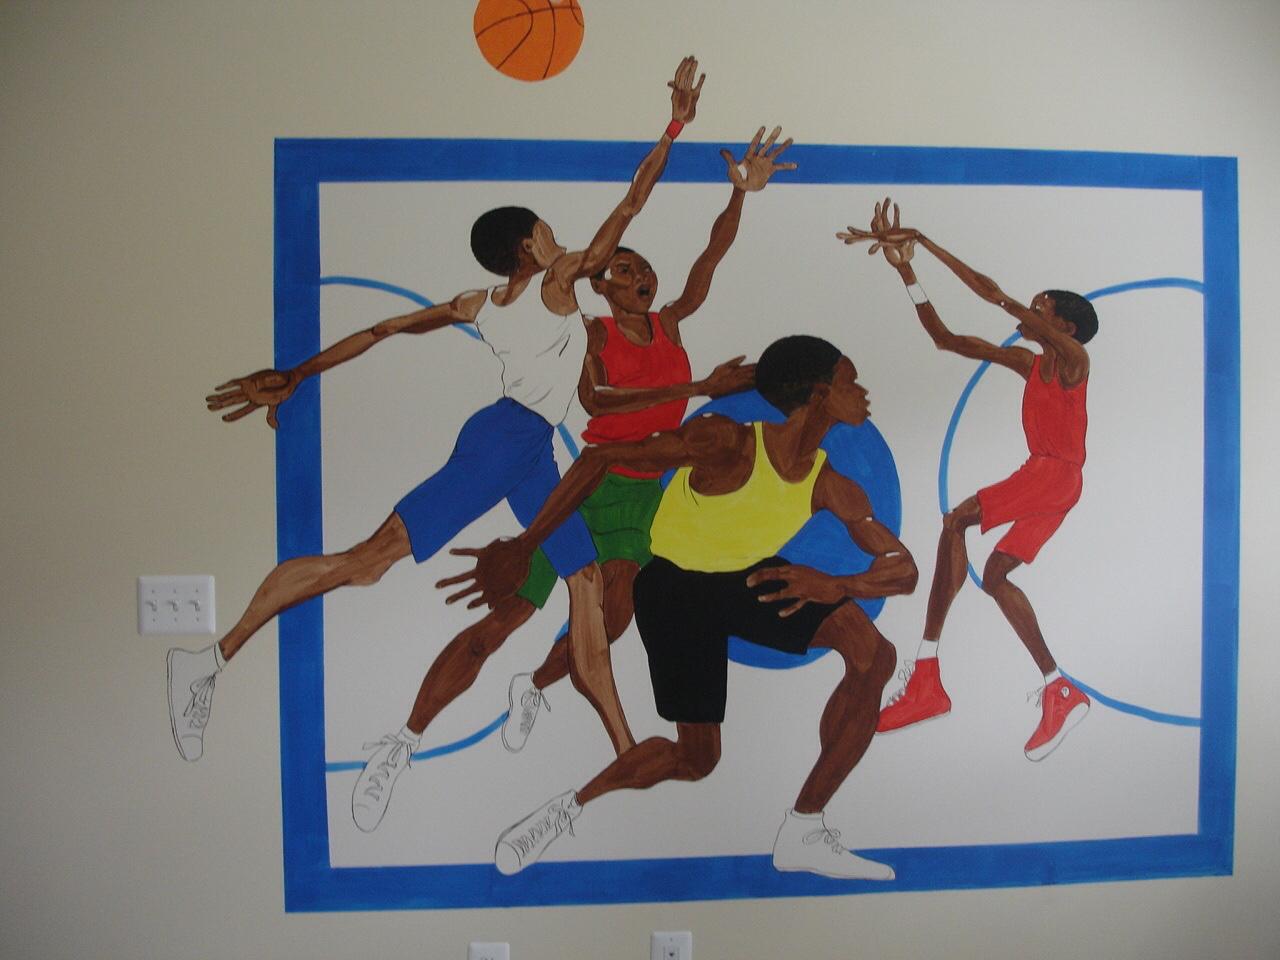 Main wall-mural